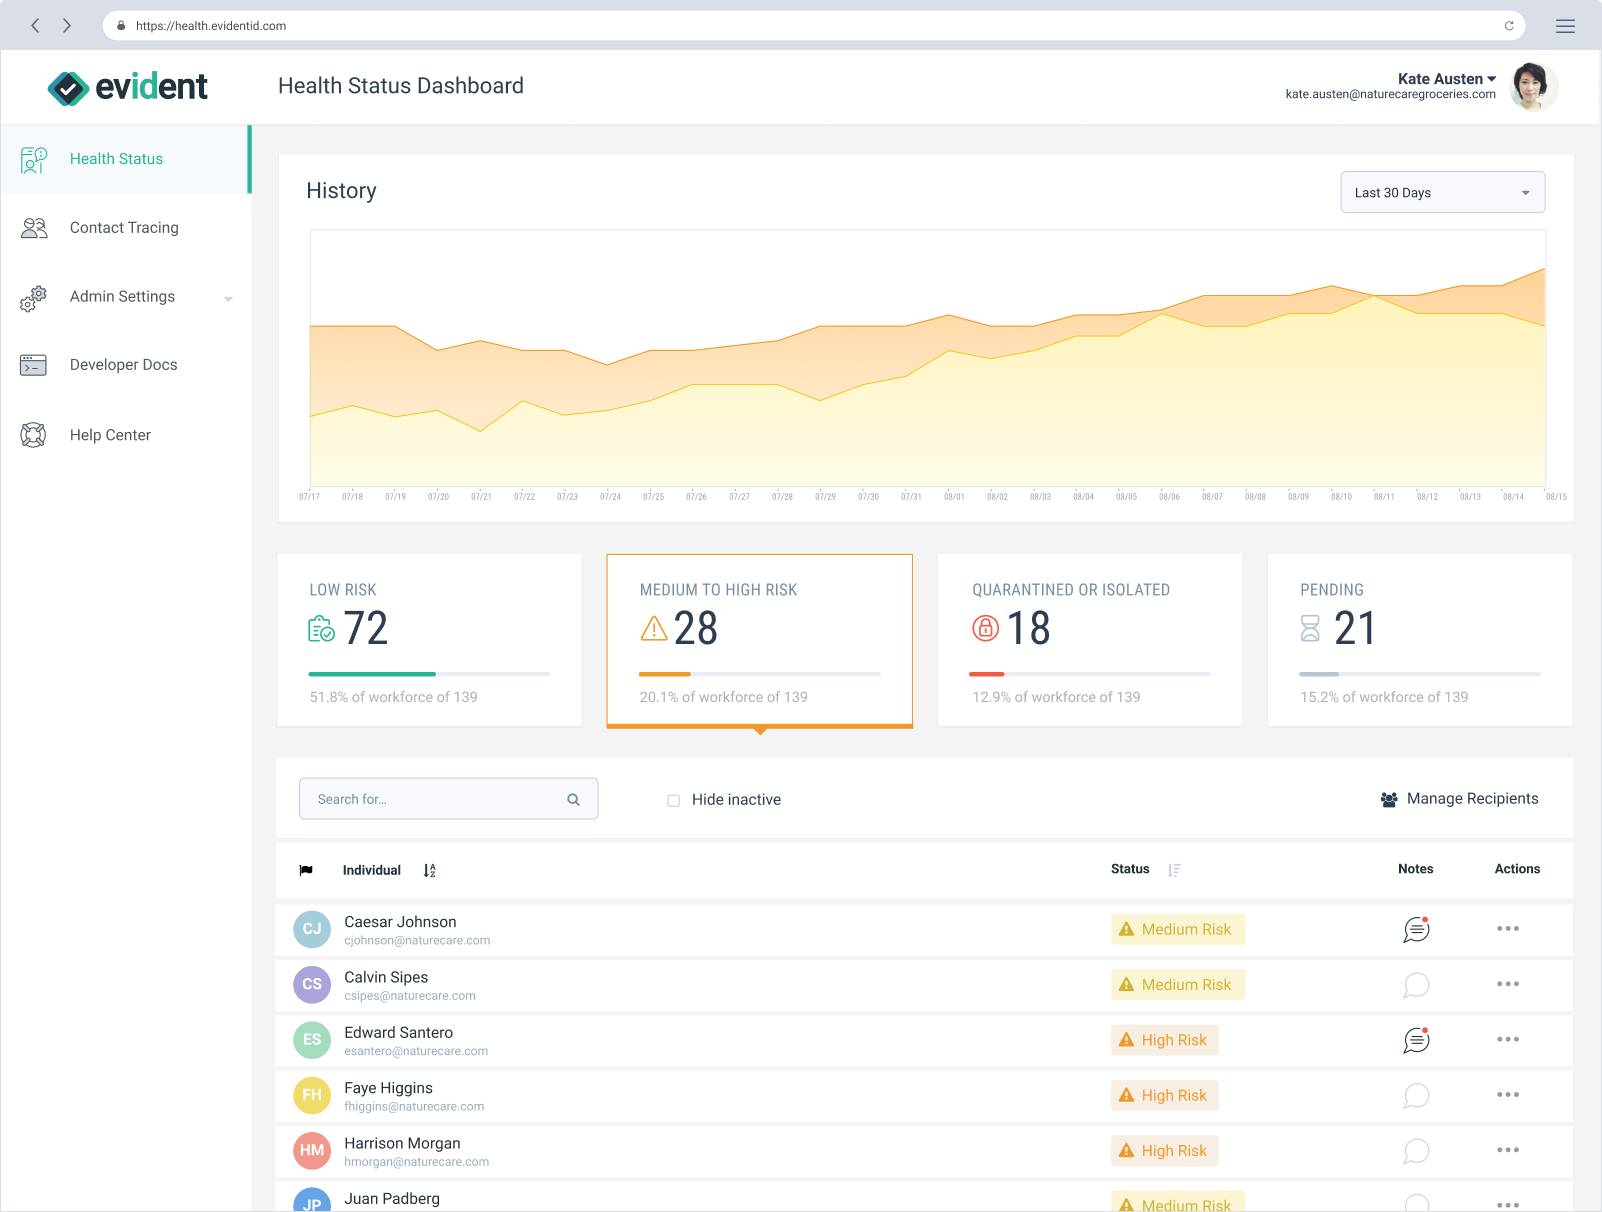 COVID-19 monitoring dashboard